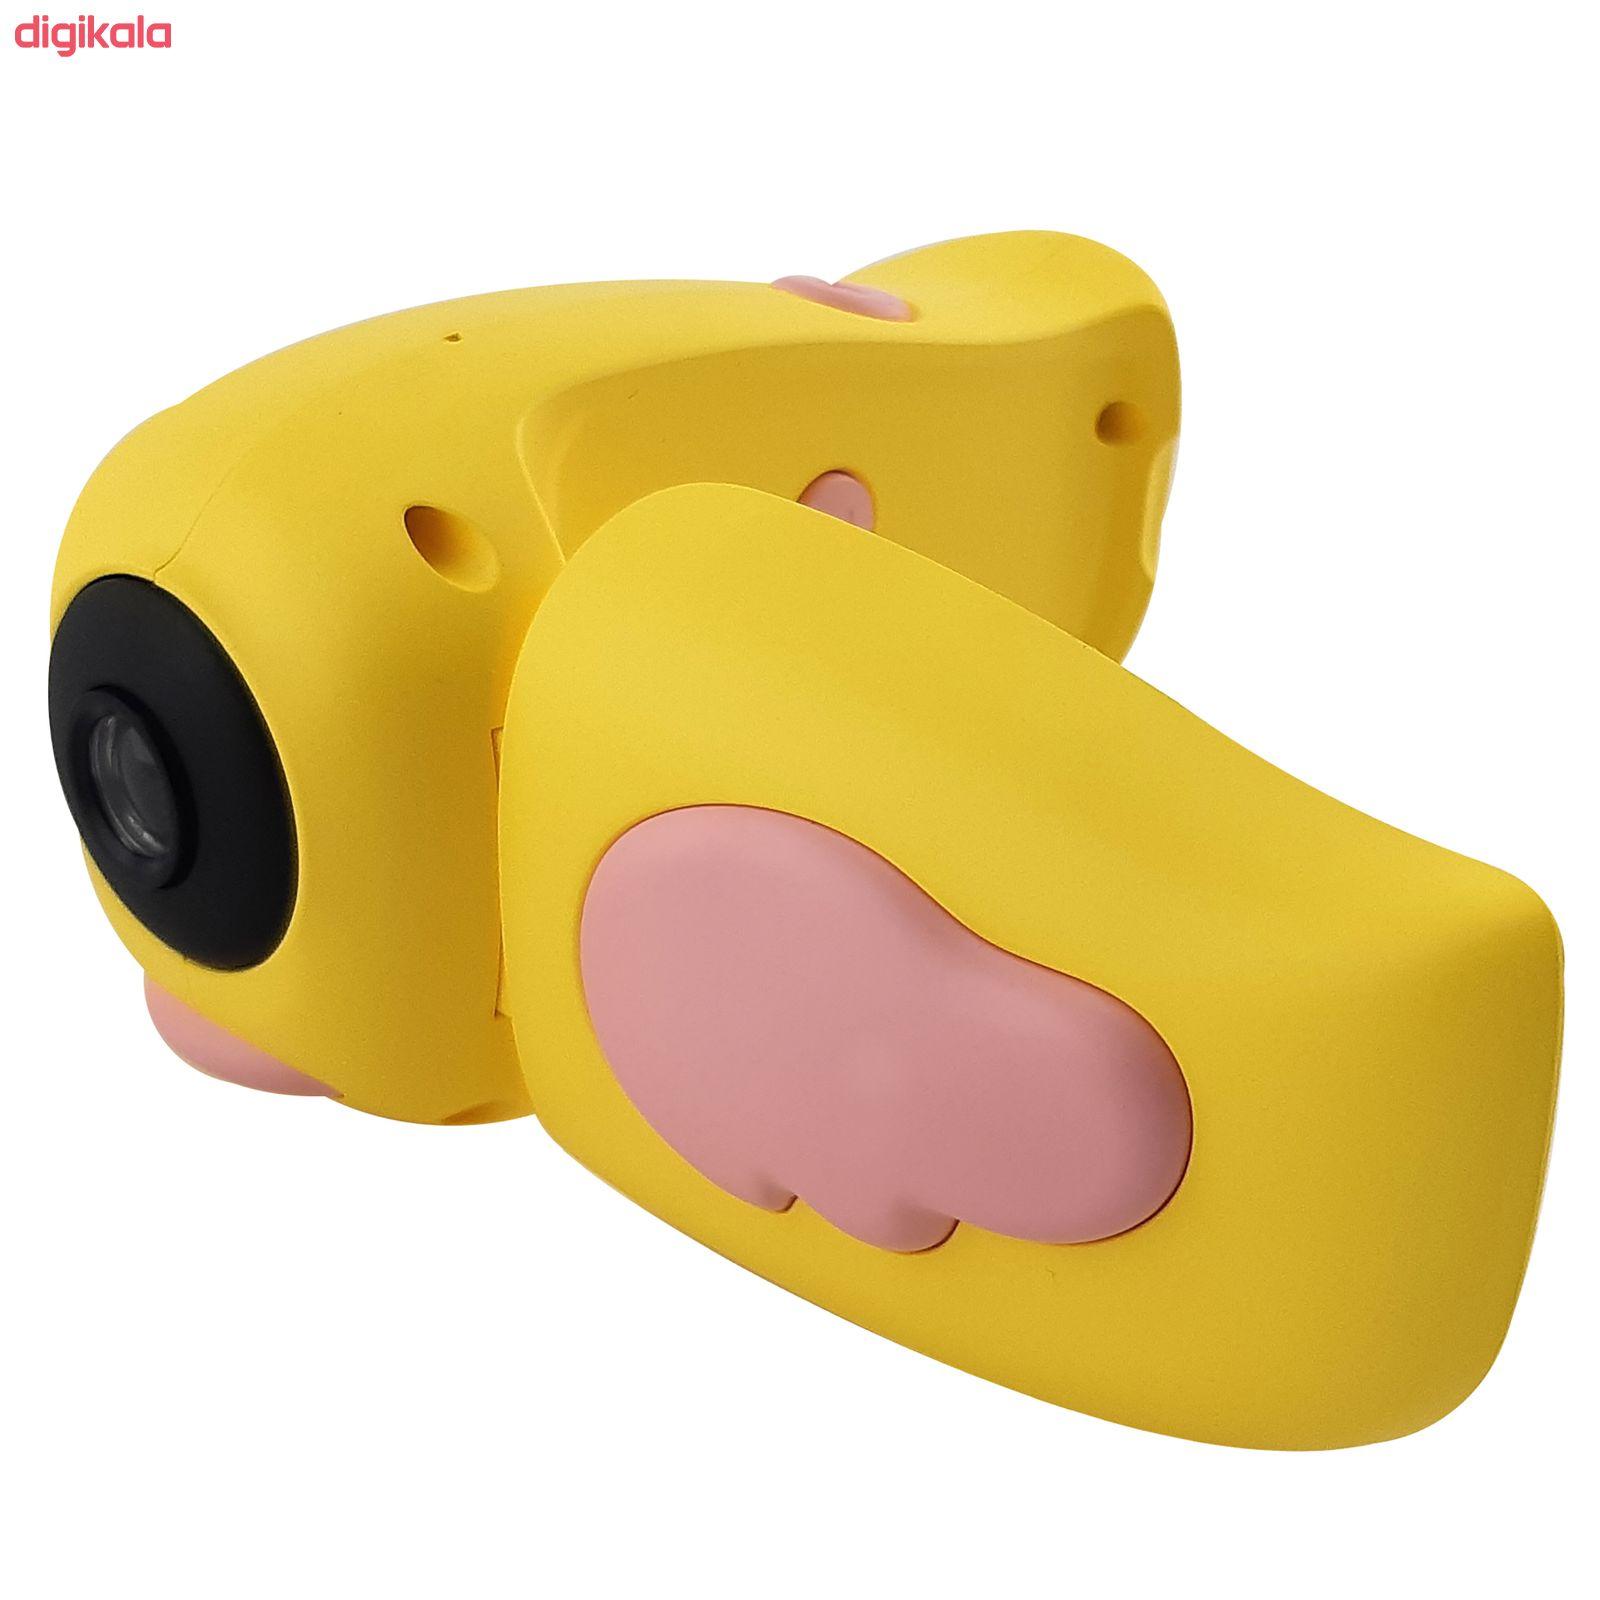 دوربین دیجیتال آکسون مدل AX6066 main 1 1